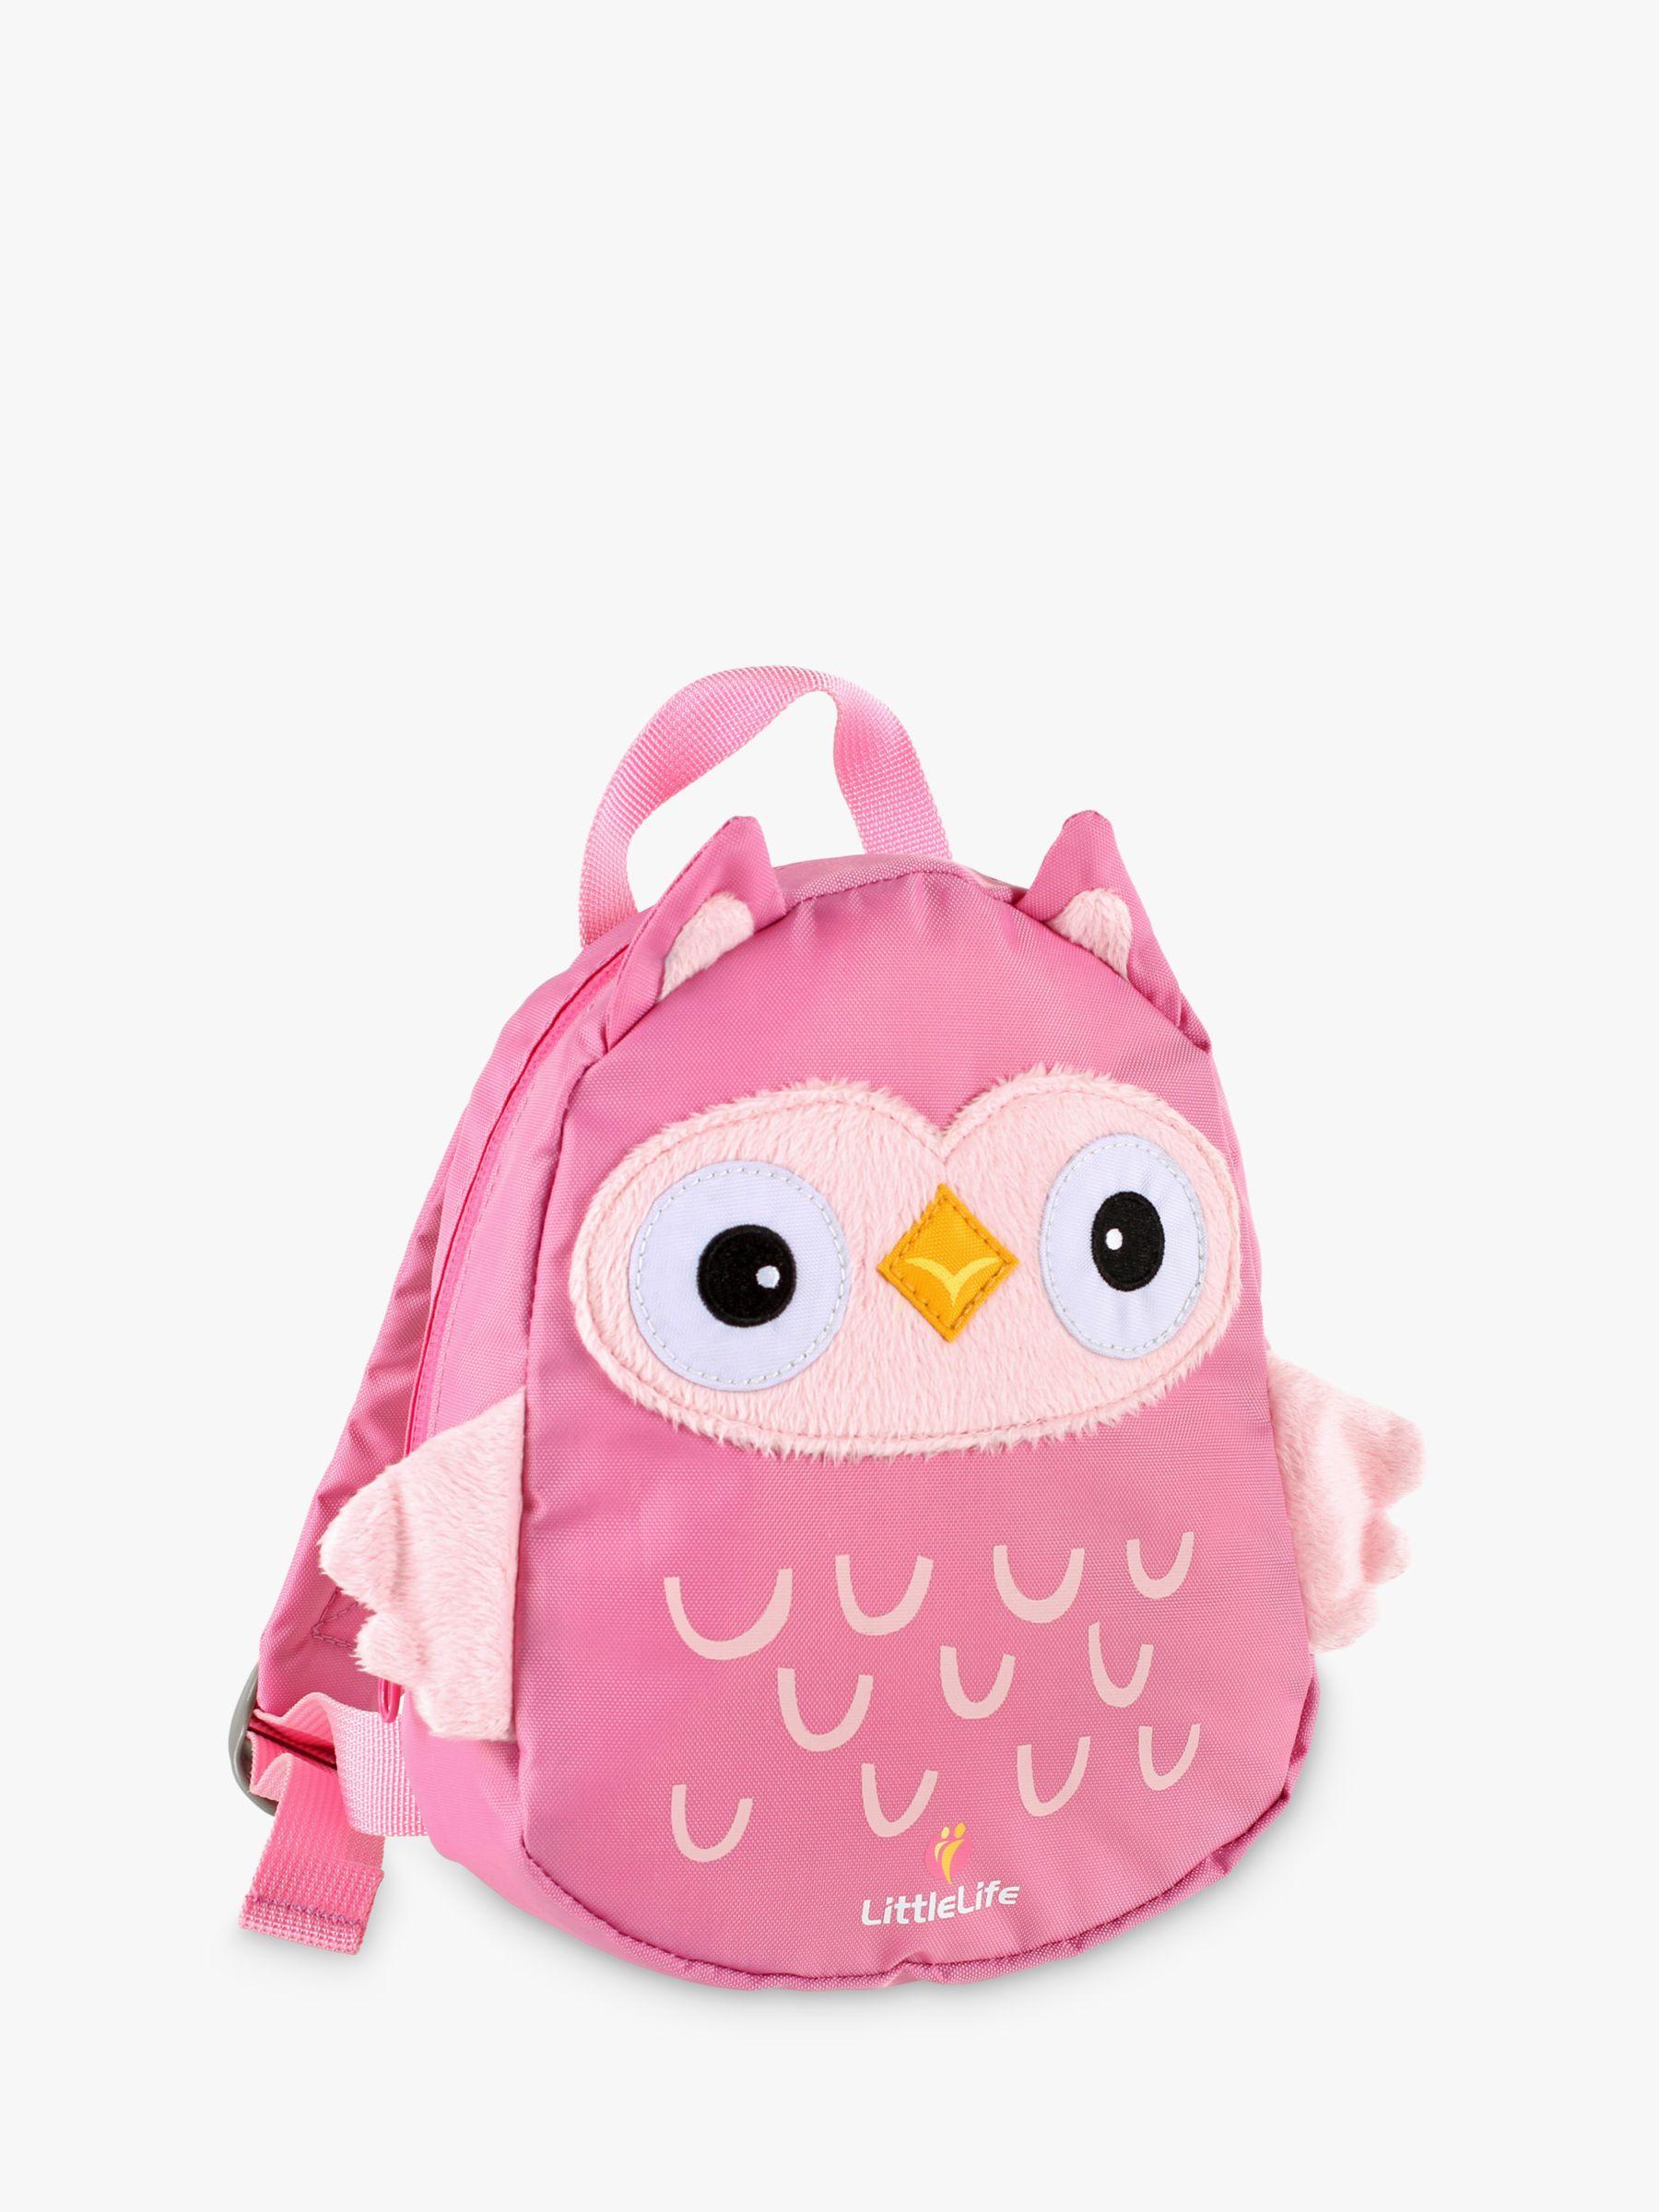 Littlelife LittleLife Toddler Backpack, Owl